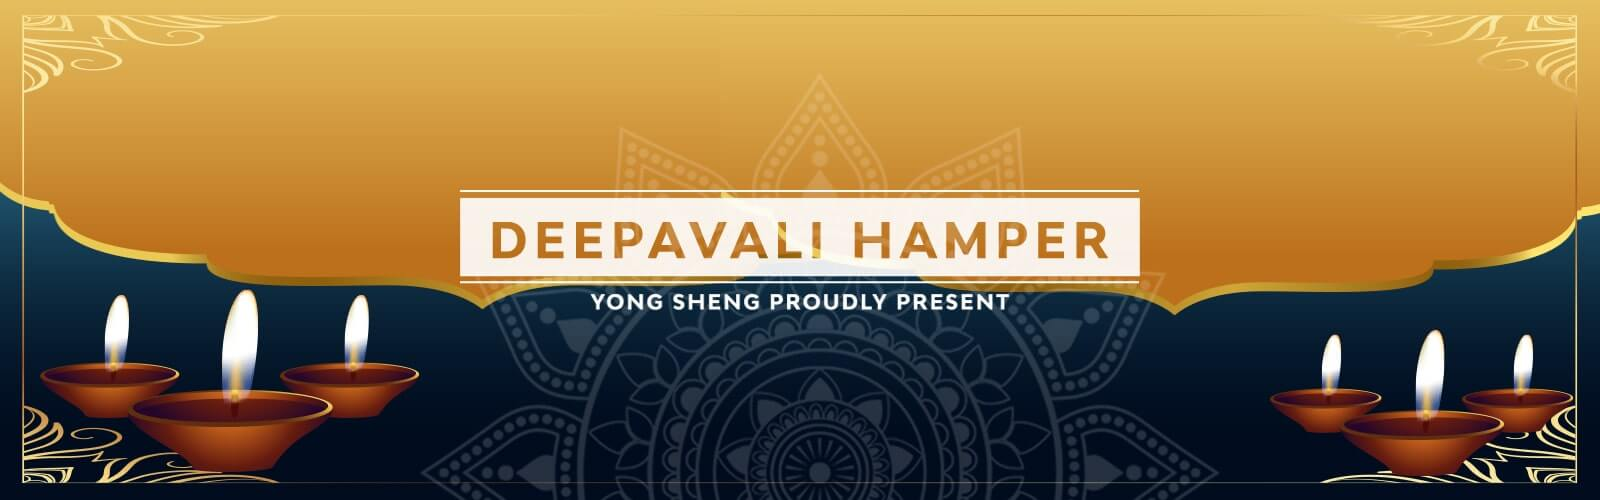 Deepavali Hamper